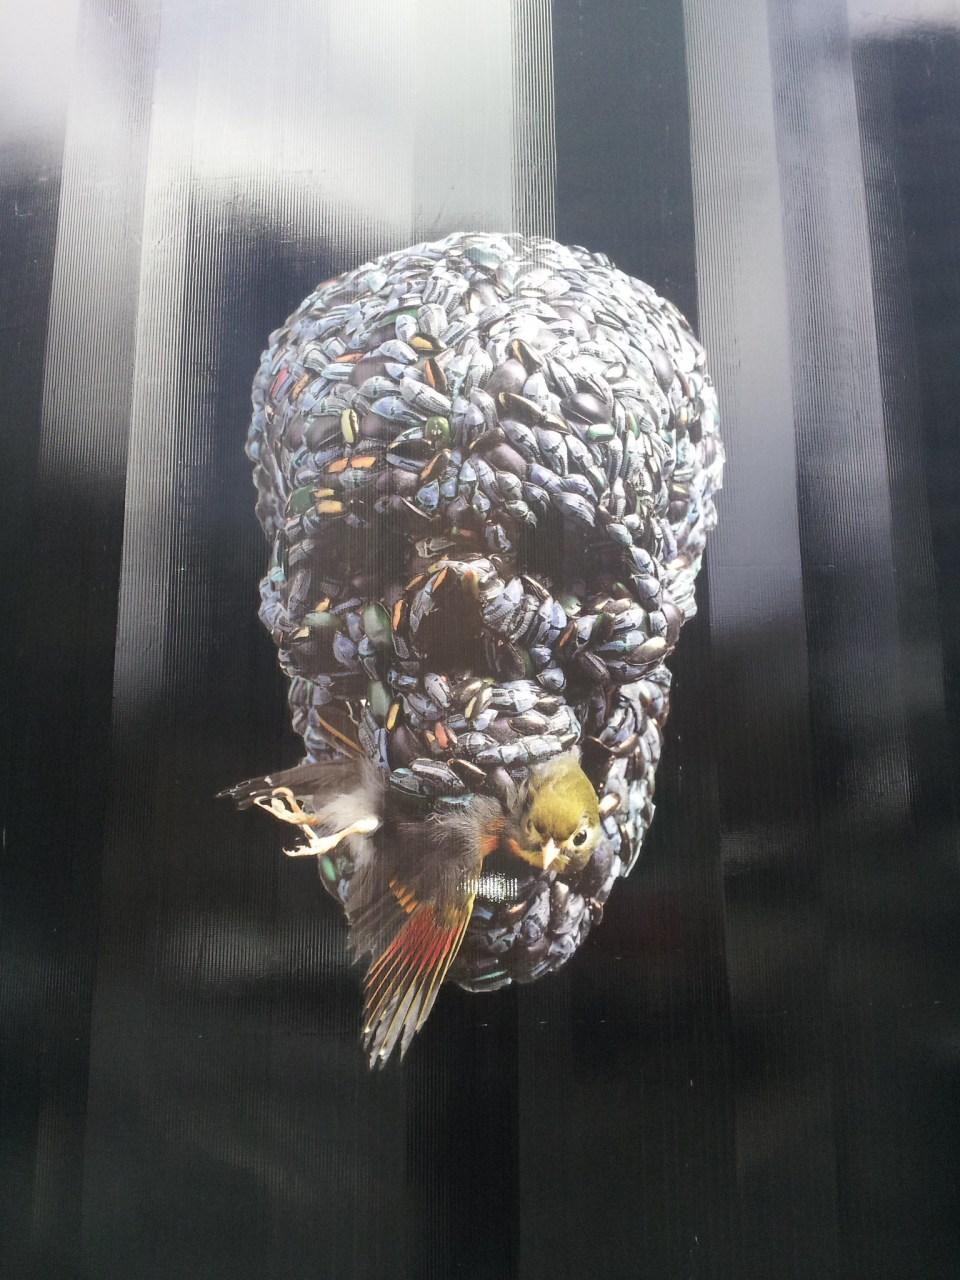 Bird food of doom